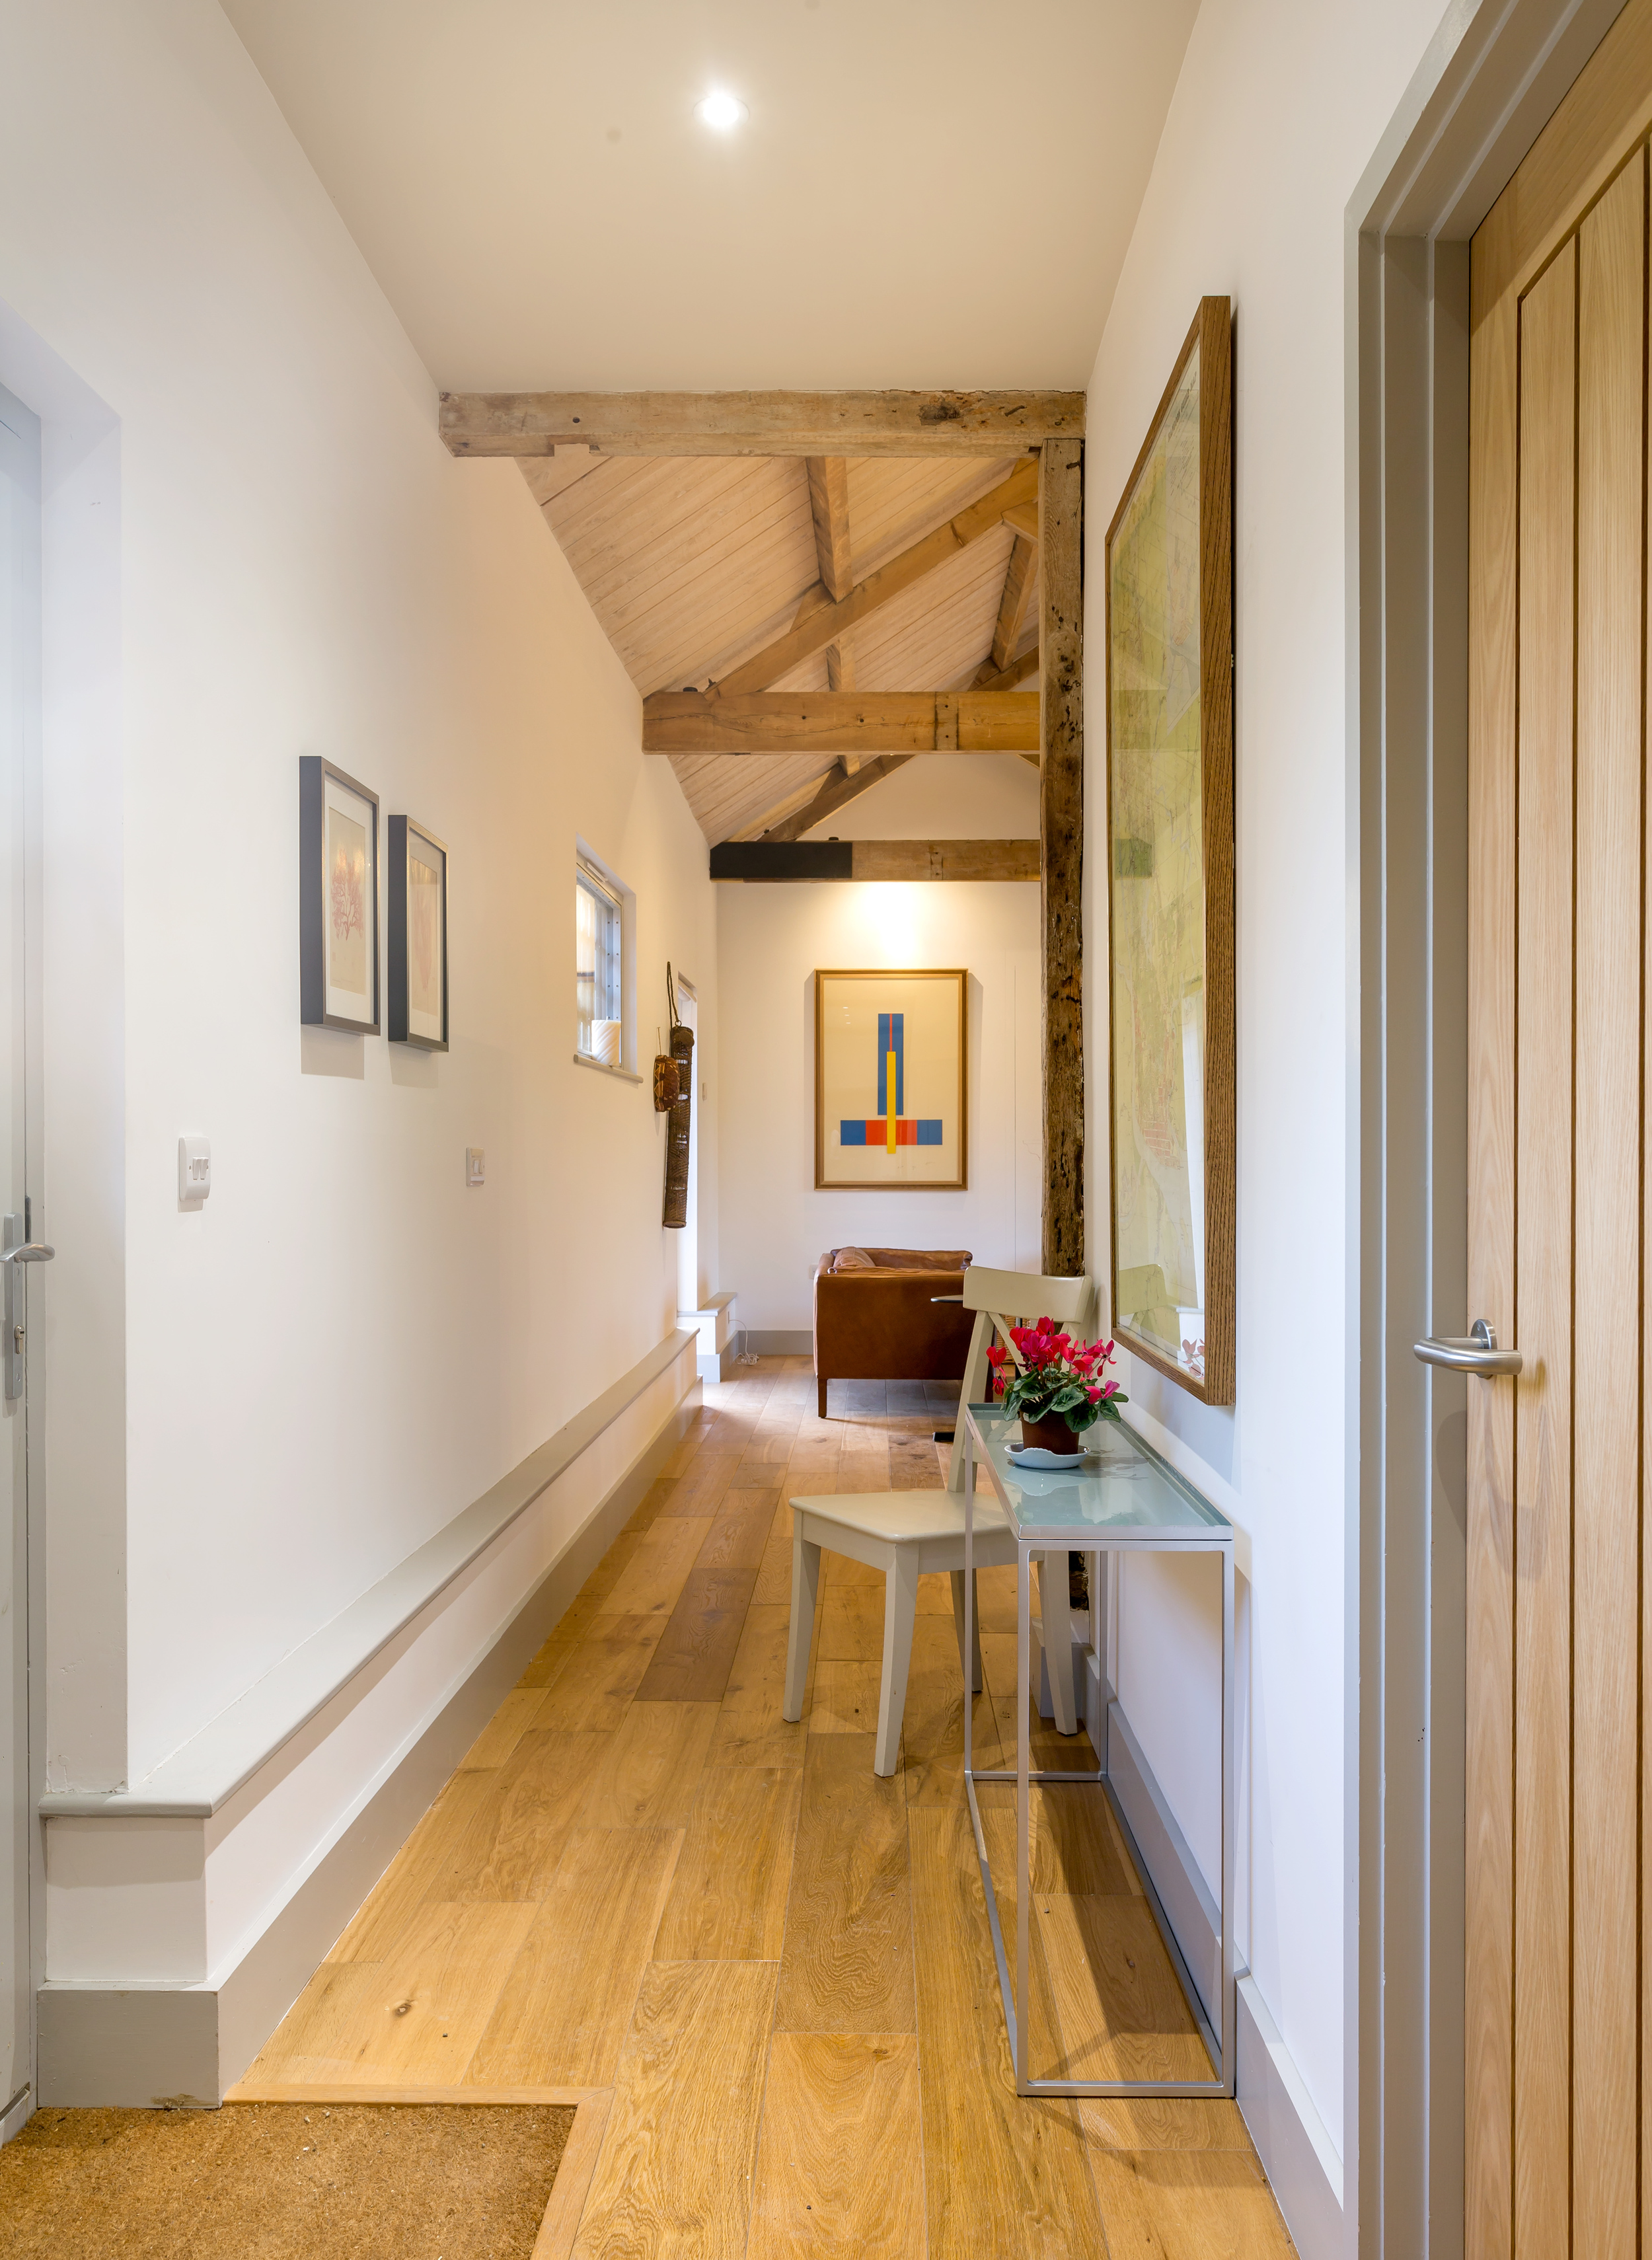 The Wagon House - Lordship's Barns - Hallway